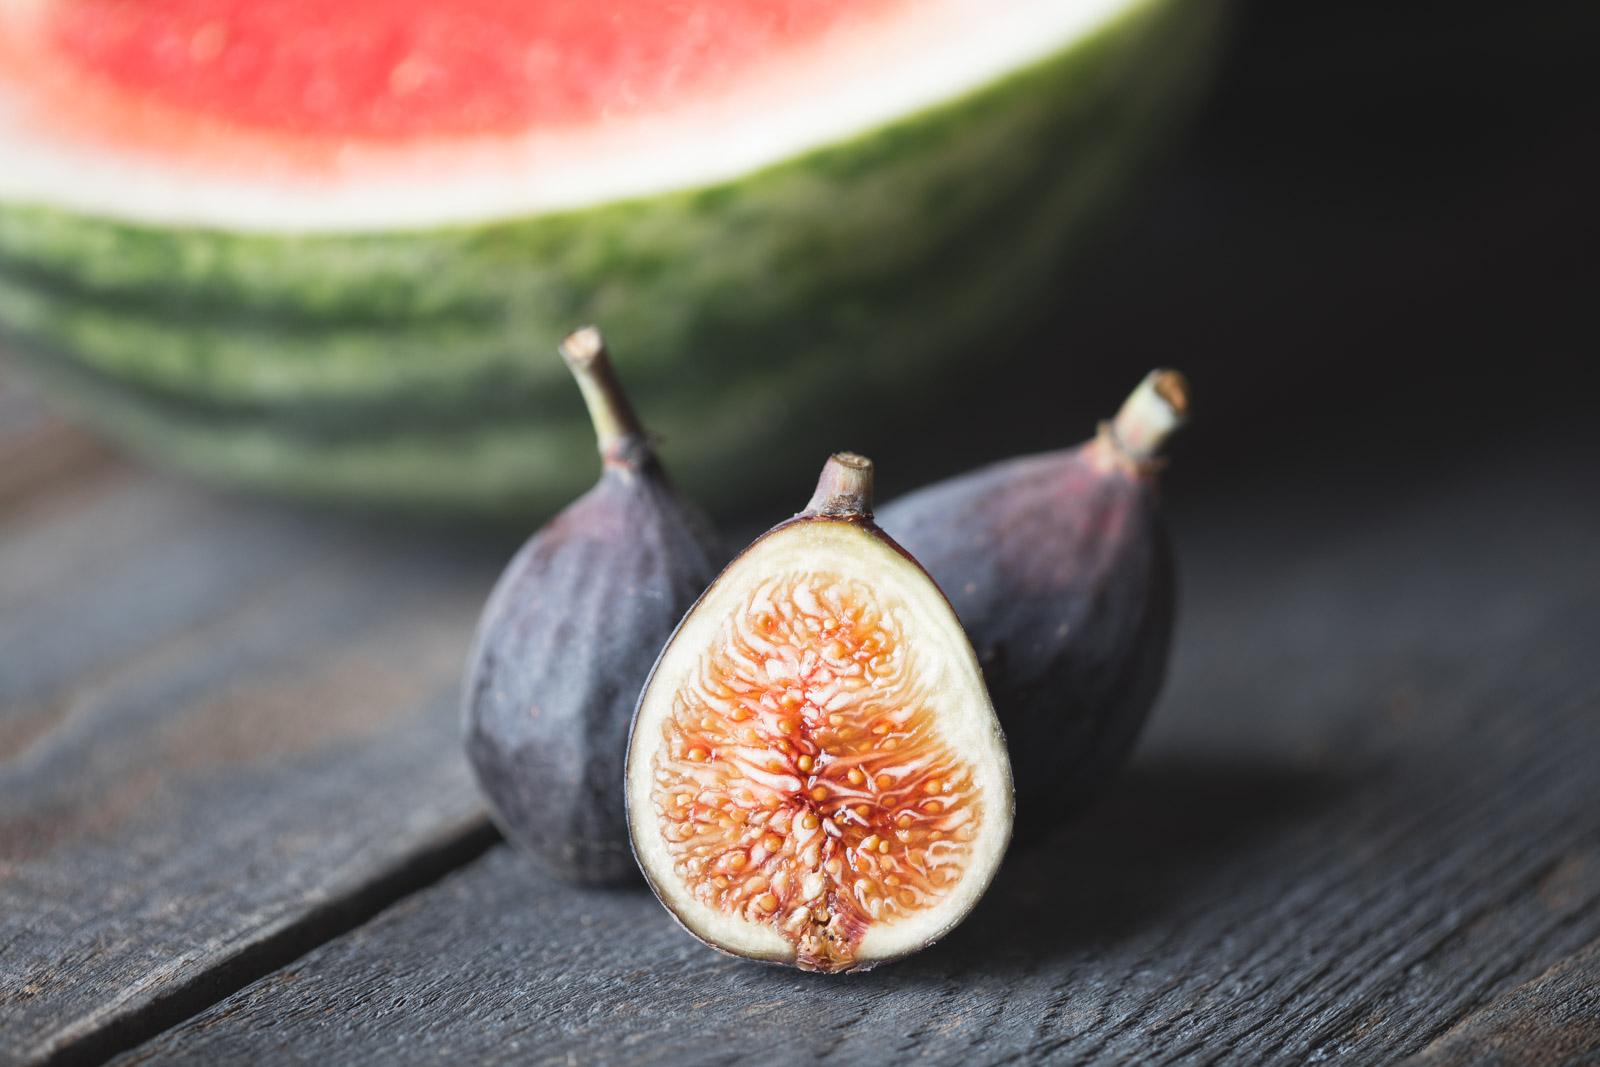 food-photography-figs-watermelon.jpg